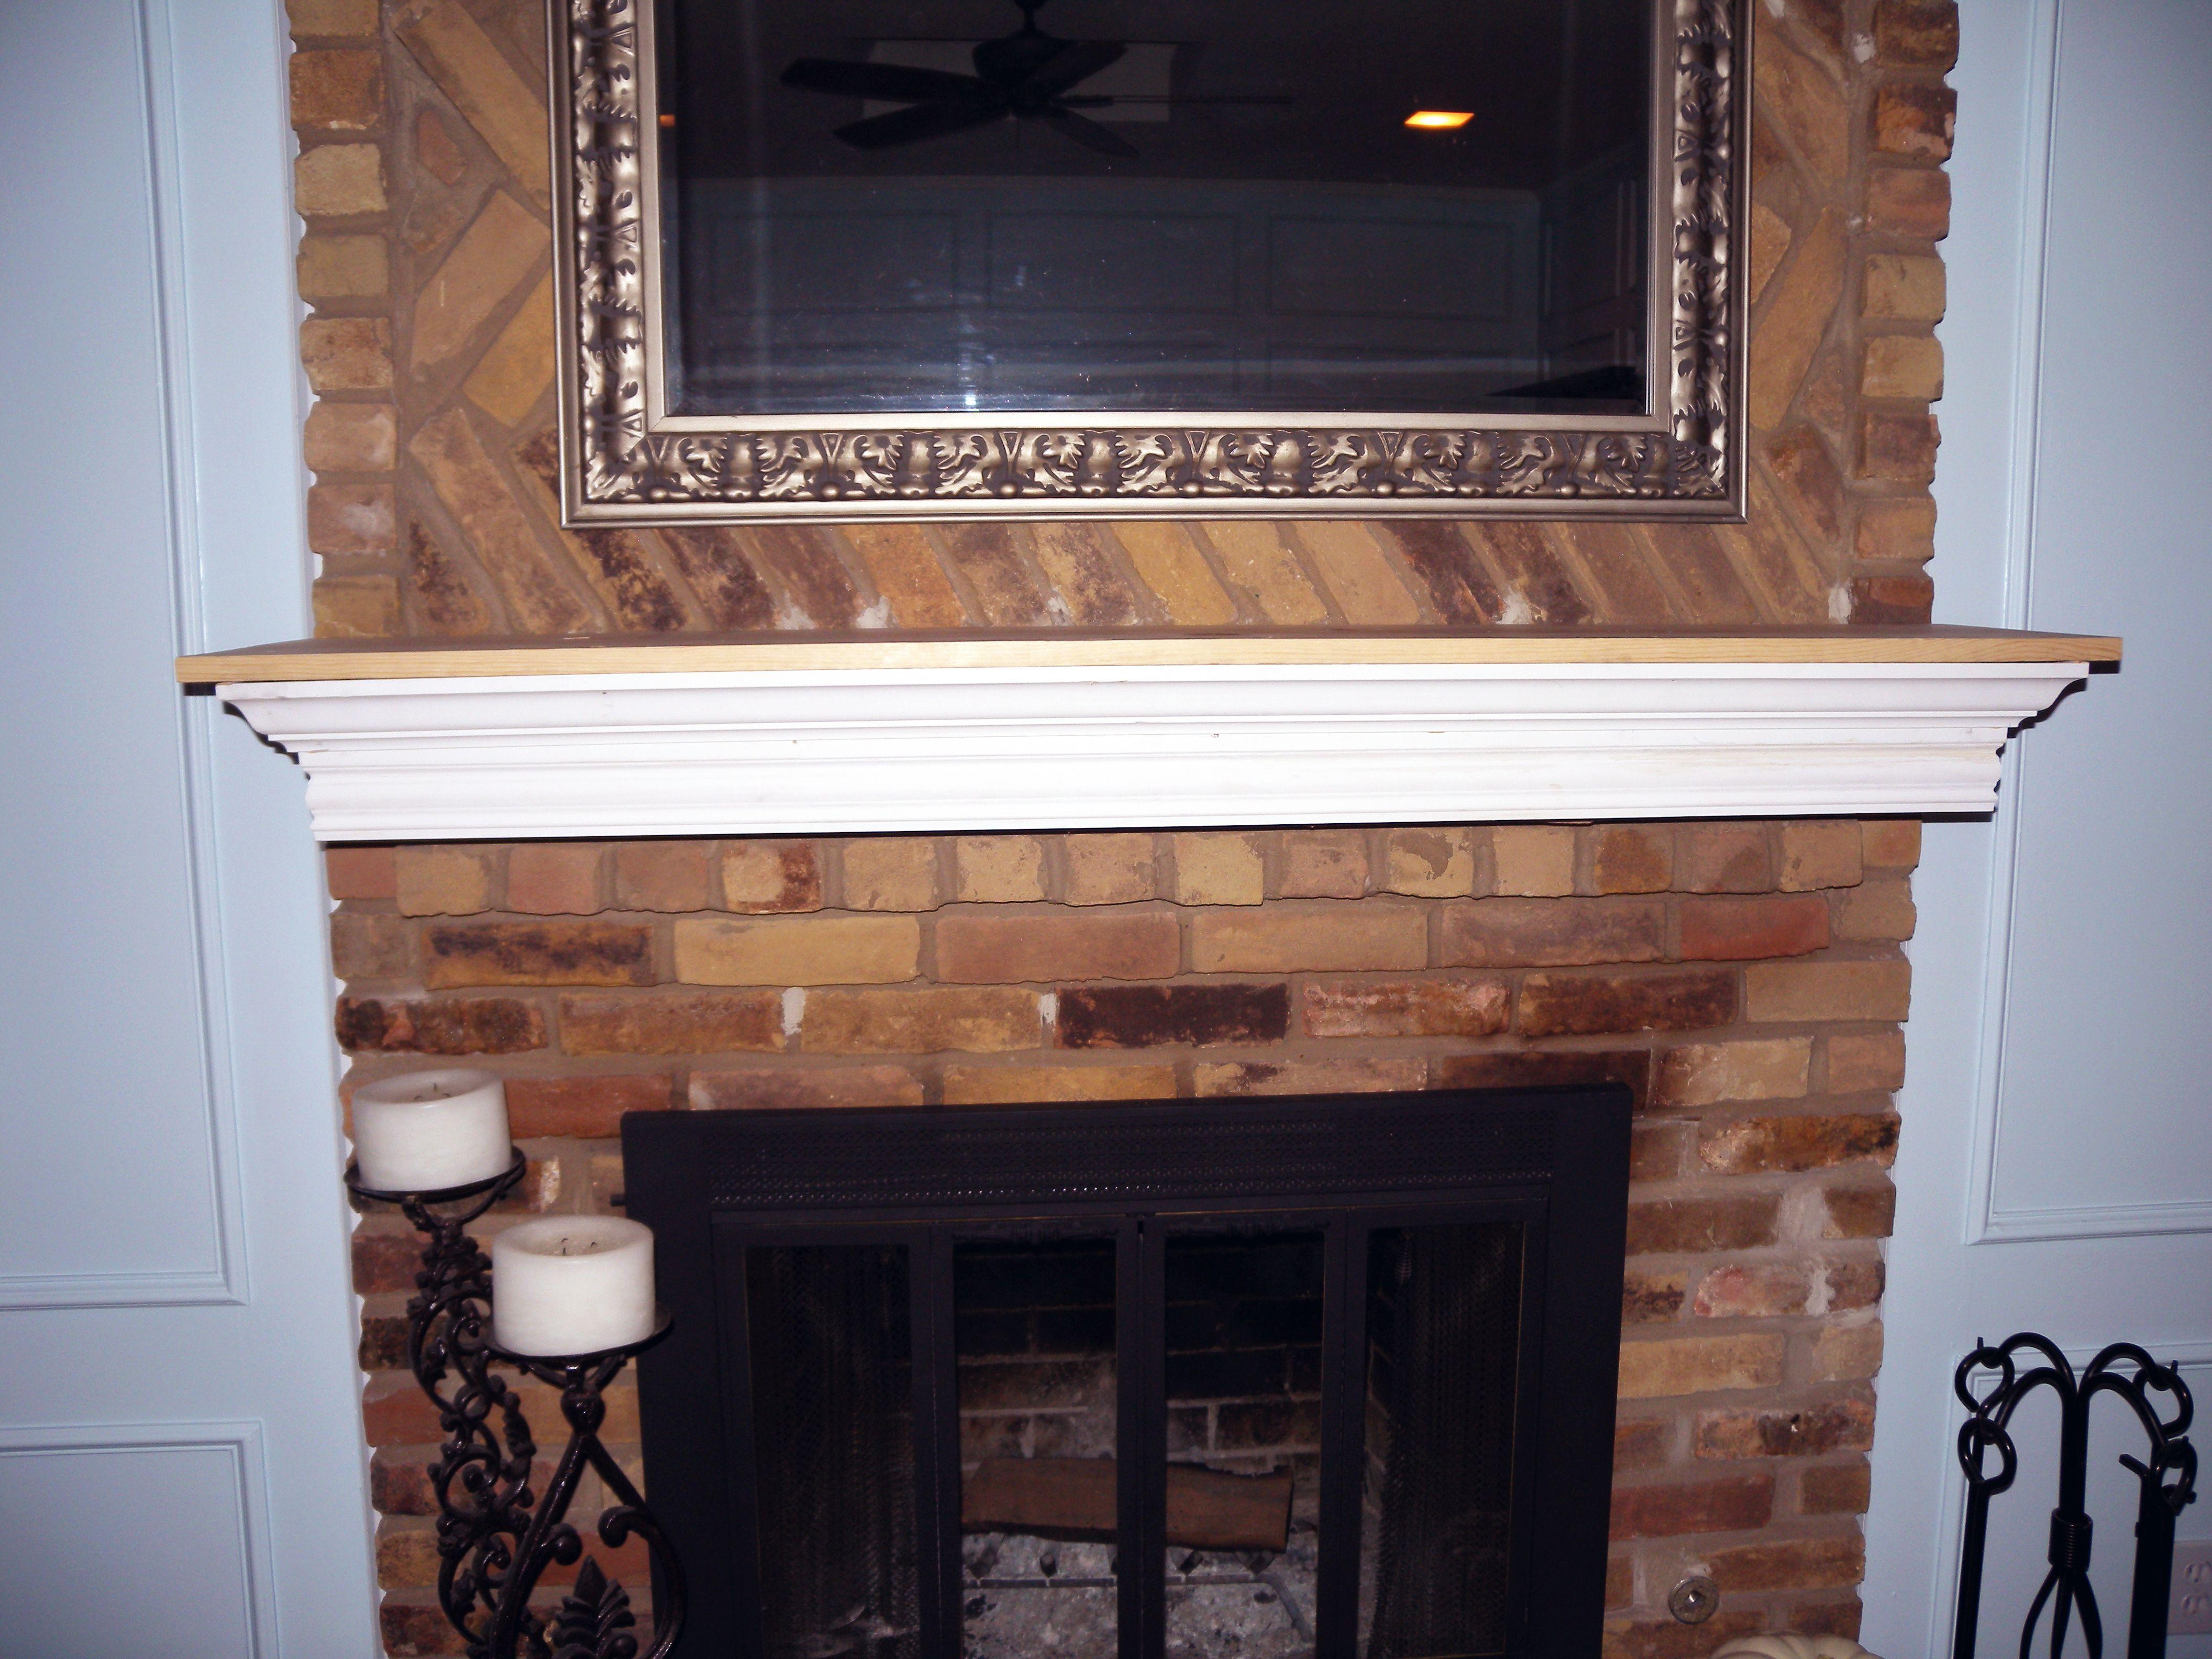 dscn0641_v2.jpg (4224×3168) Brick fireplace makeover